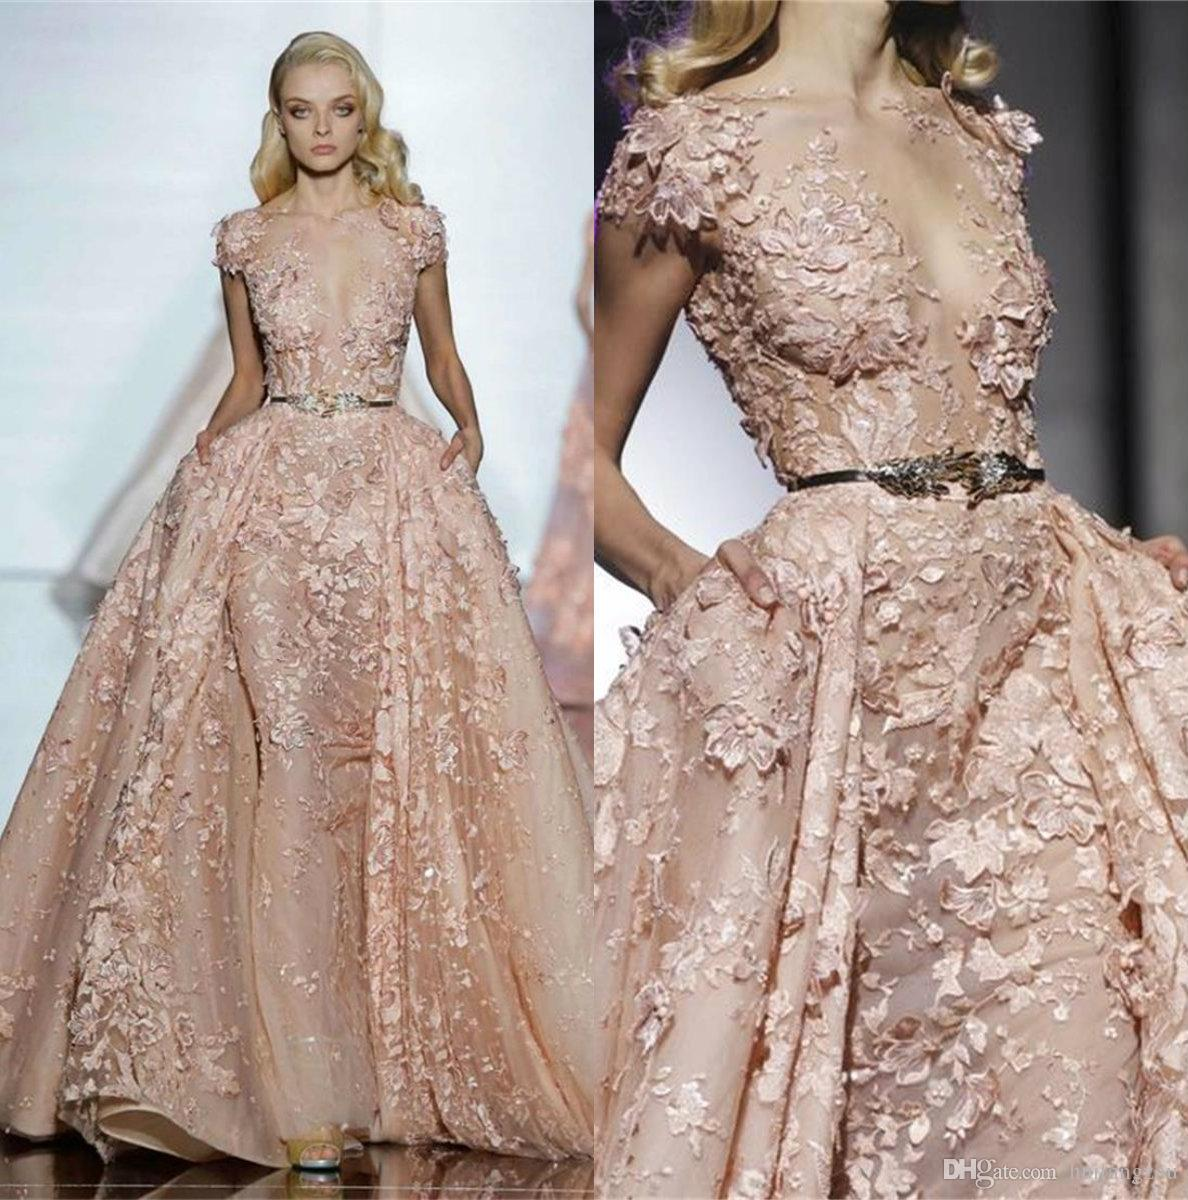 e910e4d31b Zuhair Murad Elegant Blush Pink Prom Dresses With Overkskirt Exquisite Lace  Applique Evening Gowns Party Formal Wear Leaf Belts Designer Prom Dresses  ...